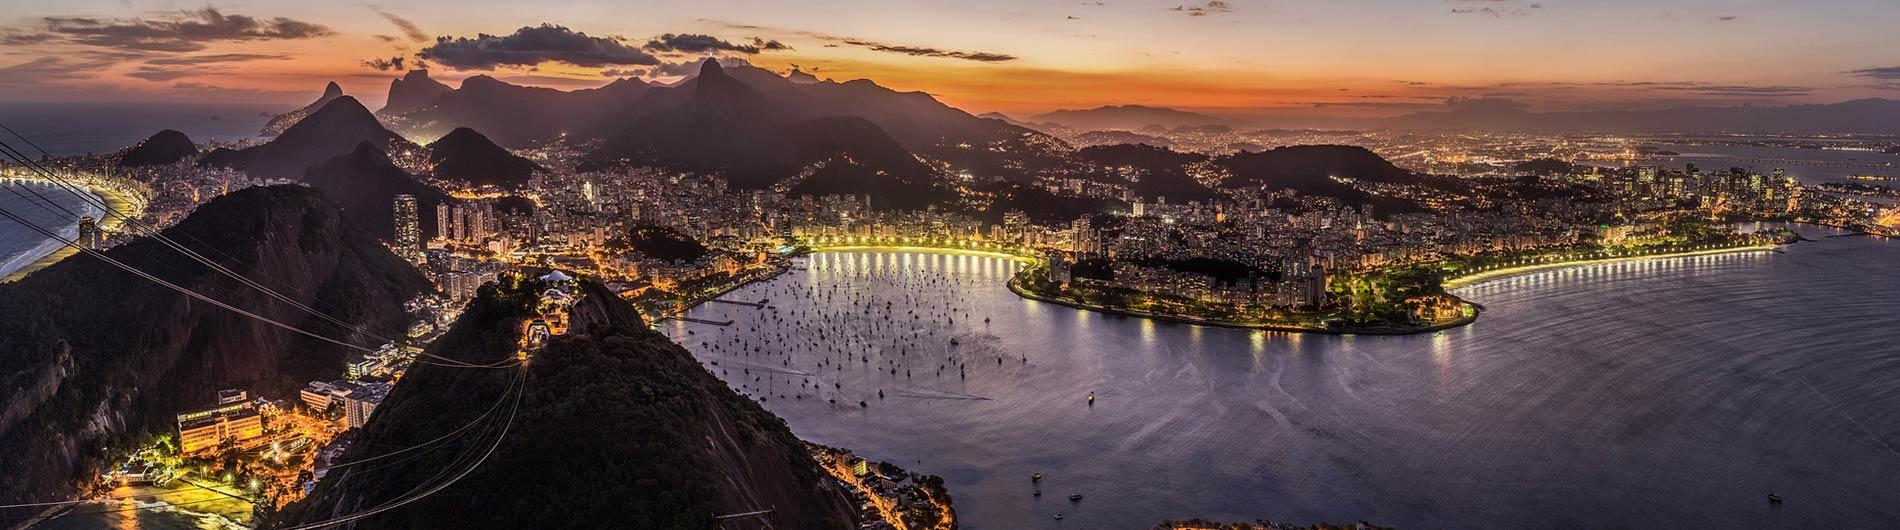 brazil environment